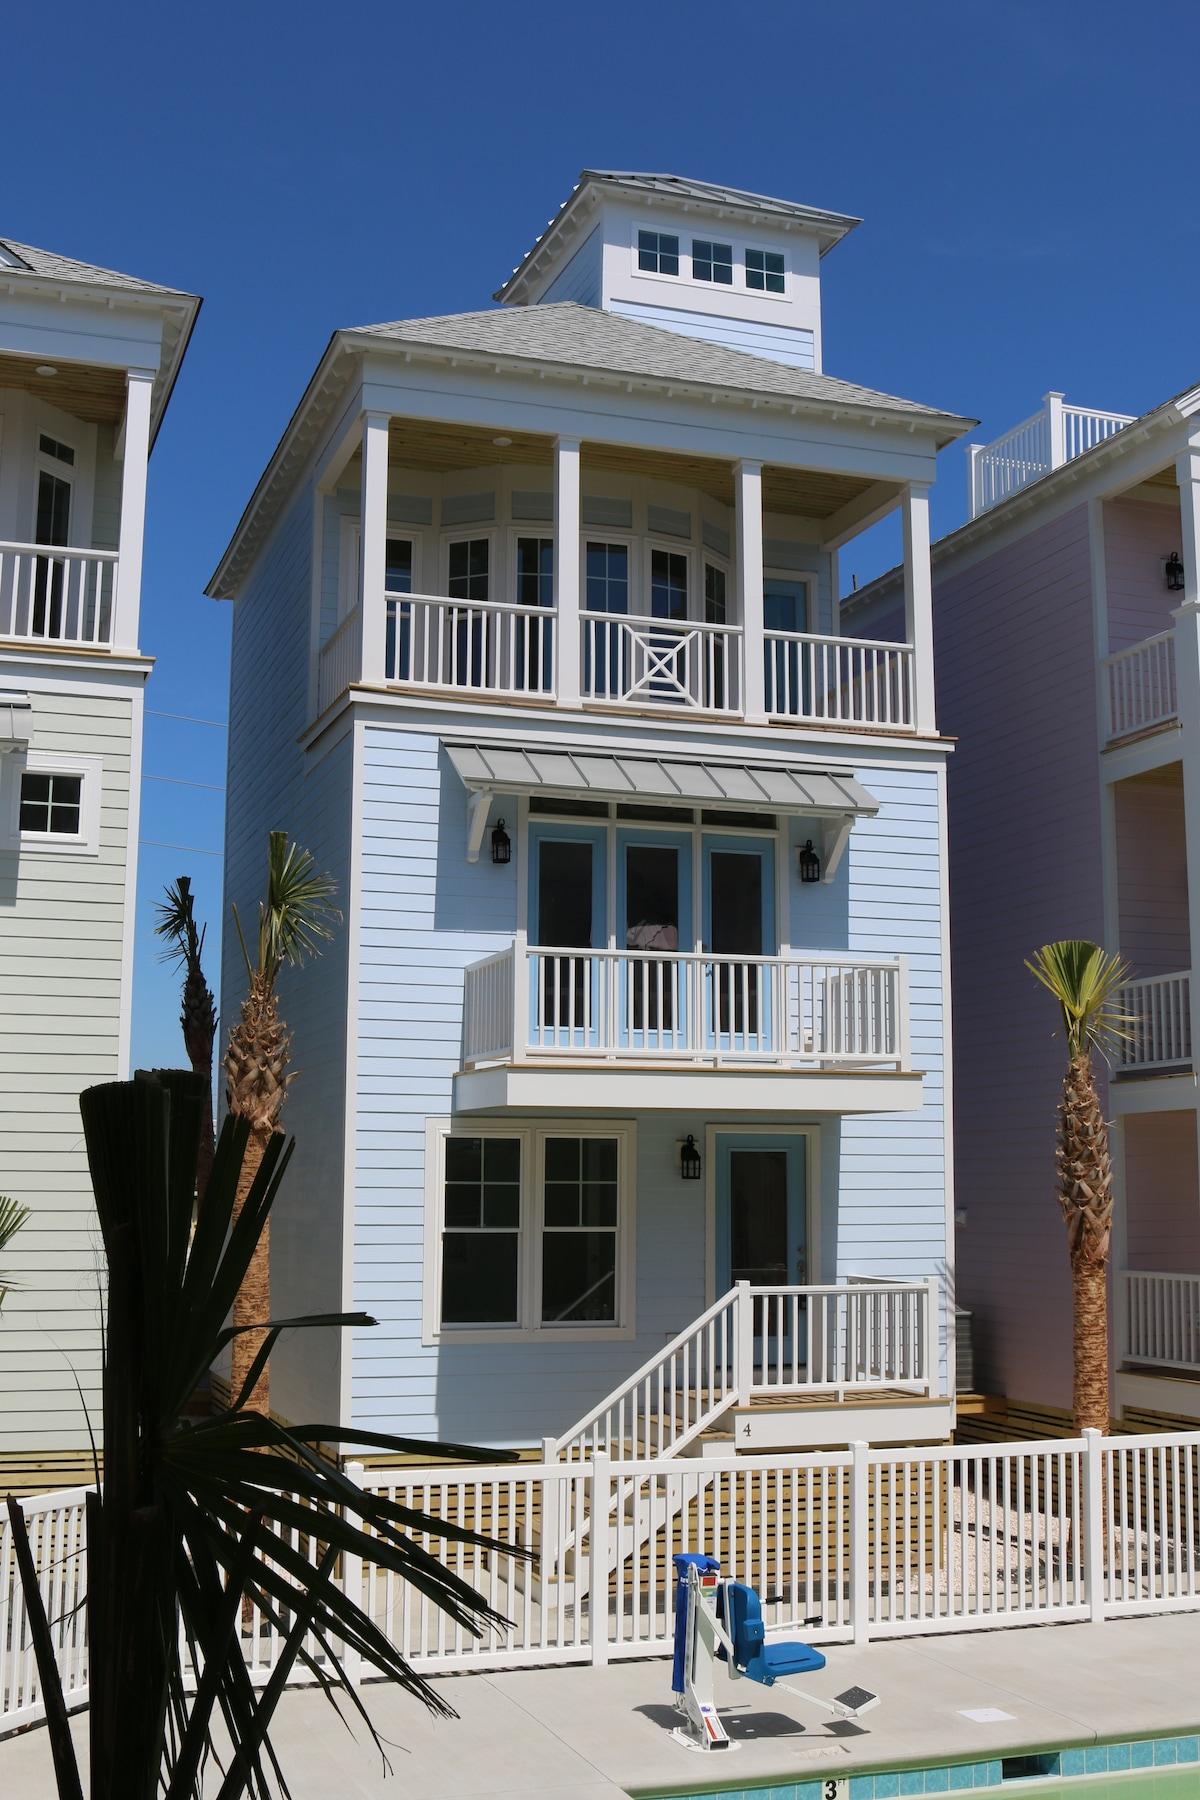 Beach House Rentals Atlantic Beach Nc Part - 39: 107 W Bogue Blvd Unit #4 Atlantic Beach NC - Houses For Rent In Atlantic  Beach, North Carolina, United States